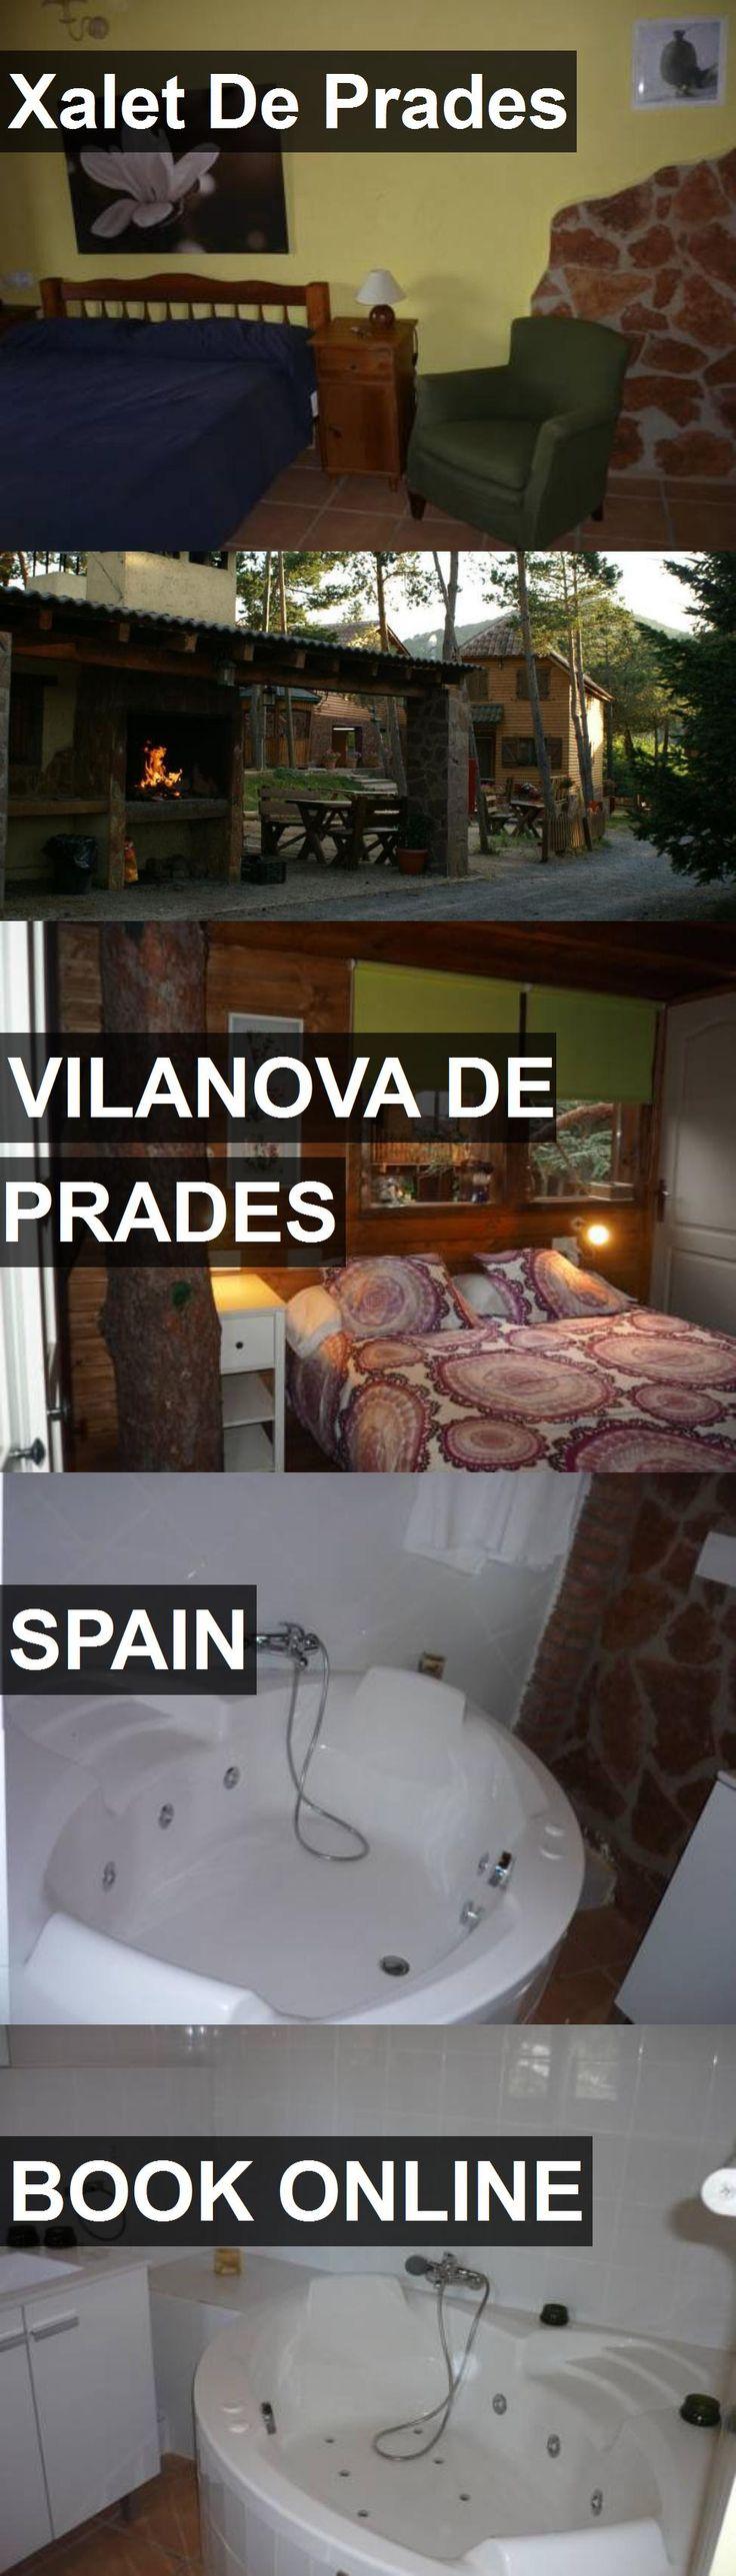 Hotel Xalet De Prades in Vilanova de Prades, Spain. For more information, photos, reviews and best prices please follow the link. #Spain #VilanovadePrades #travel #vacation #hotel